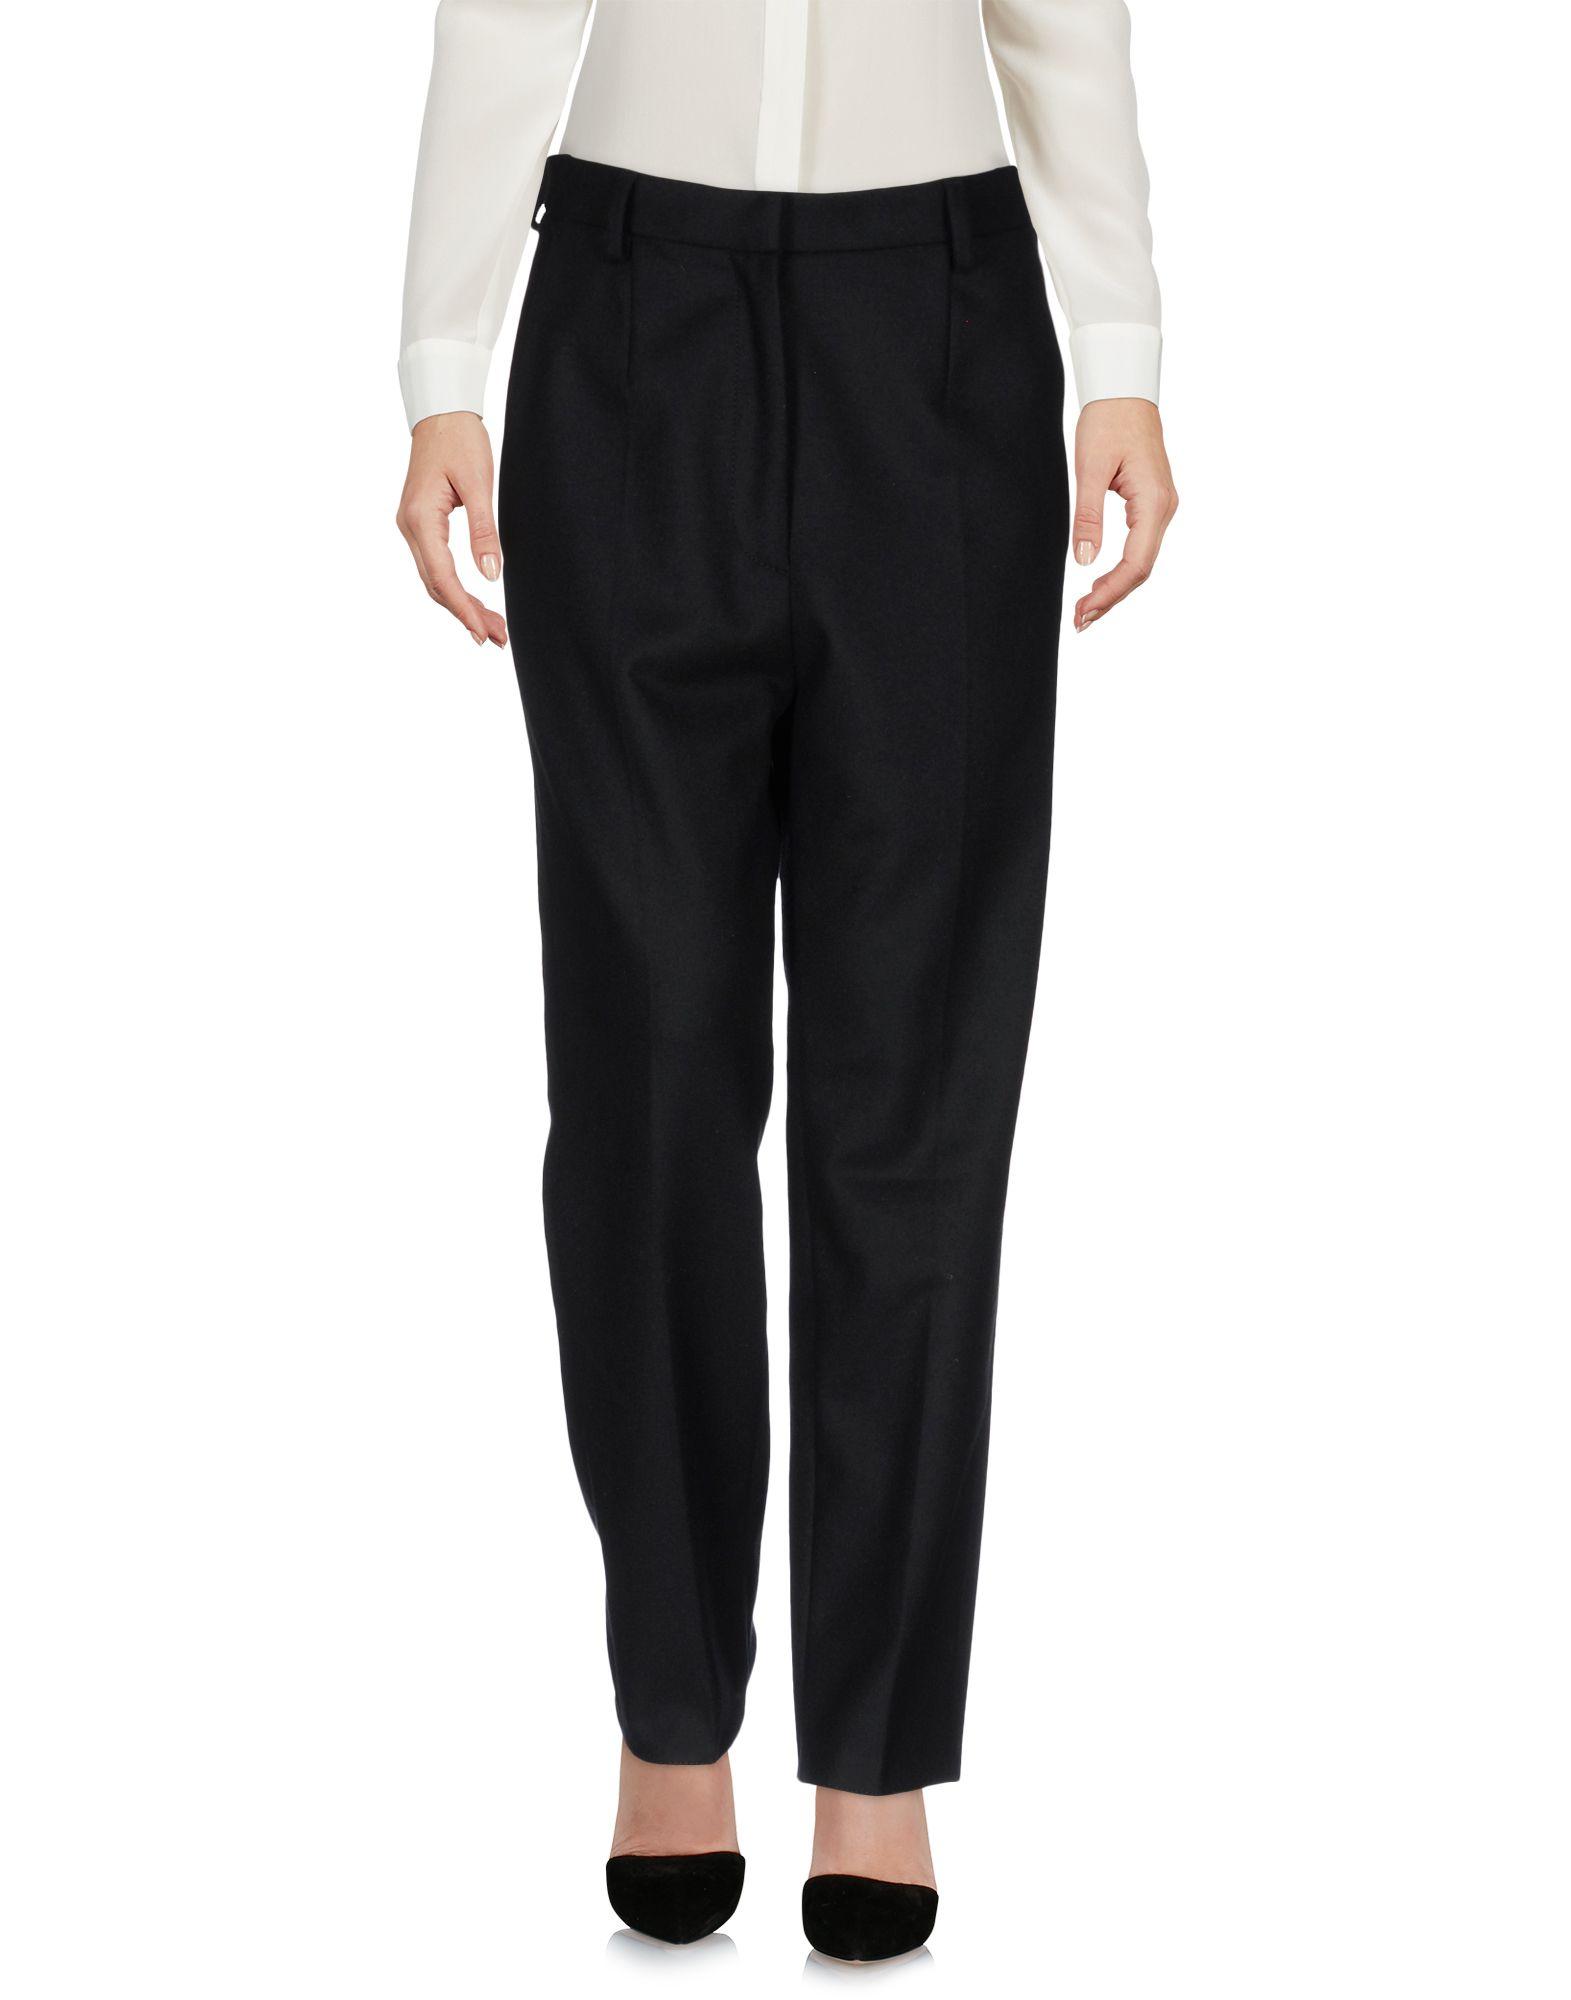 Pantalone Mm6 Maison Margiela Donna - Acquista online su tGKOygXO